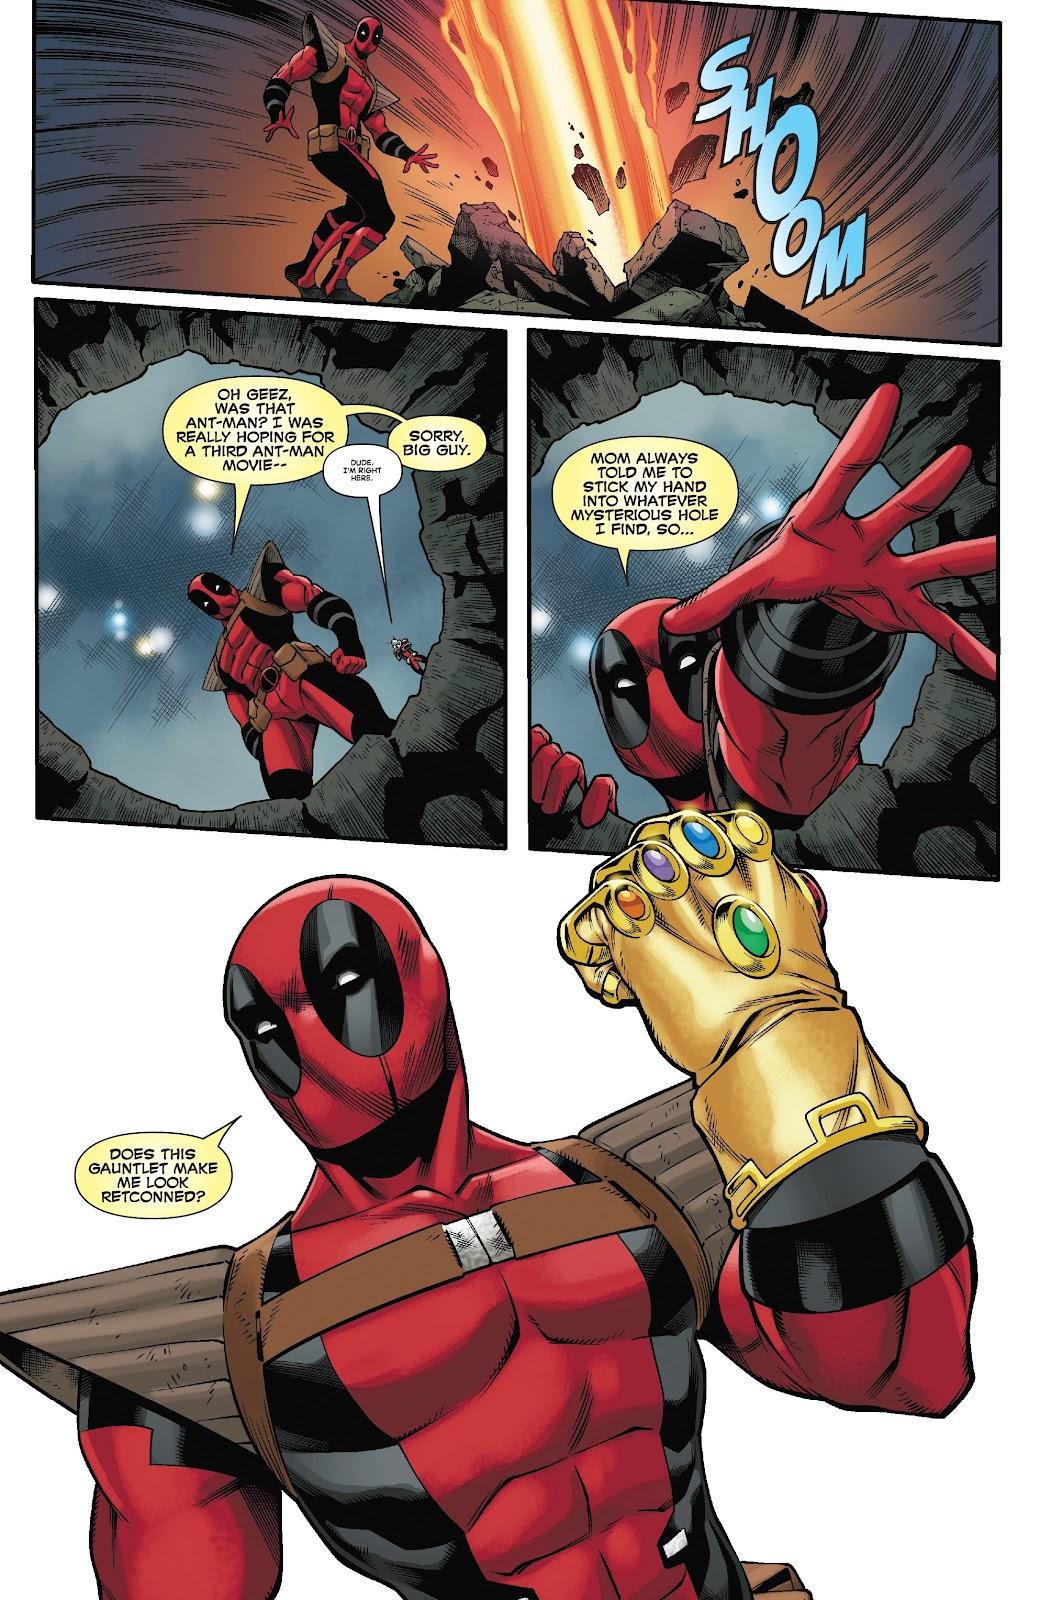 Read online Spider-Man/Deadpool comic -  Issue #49 - 11